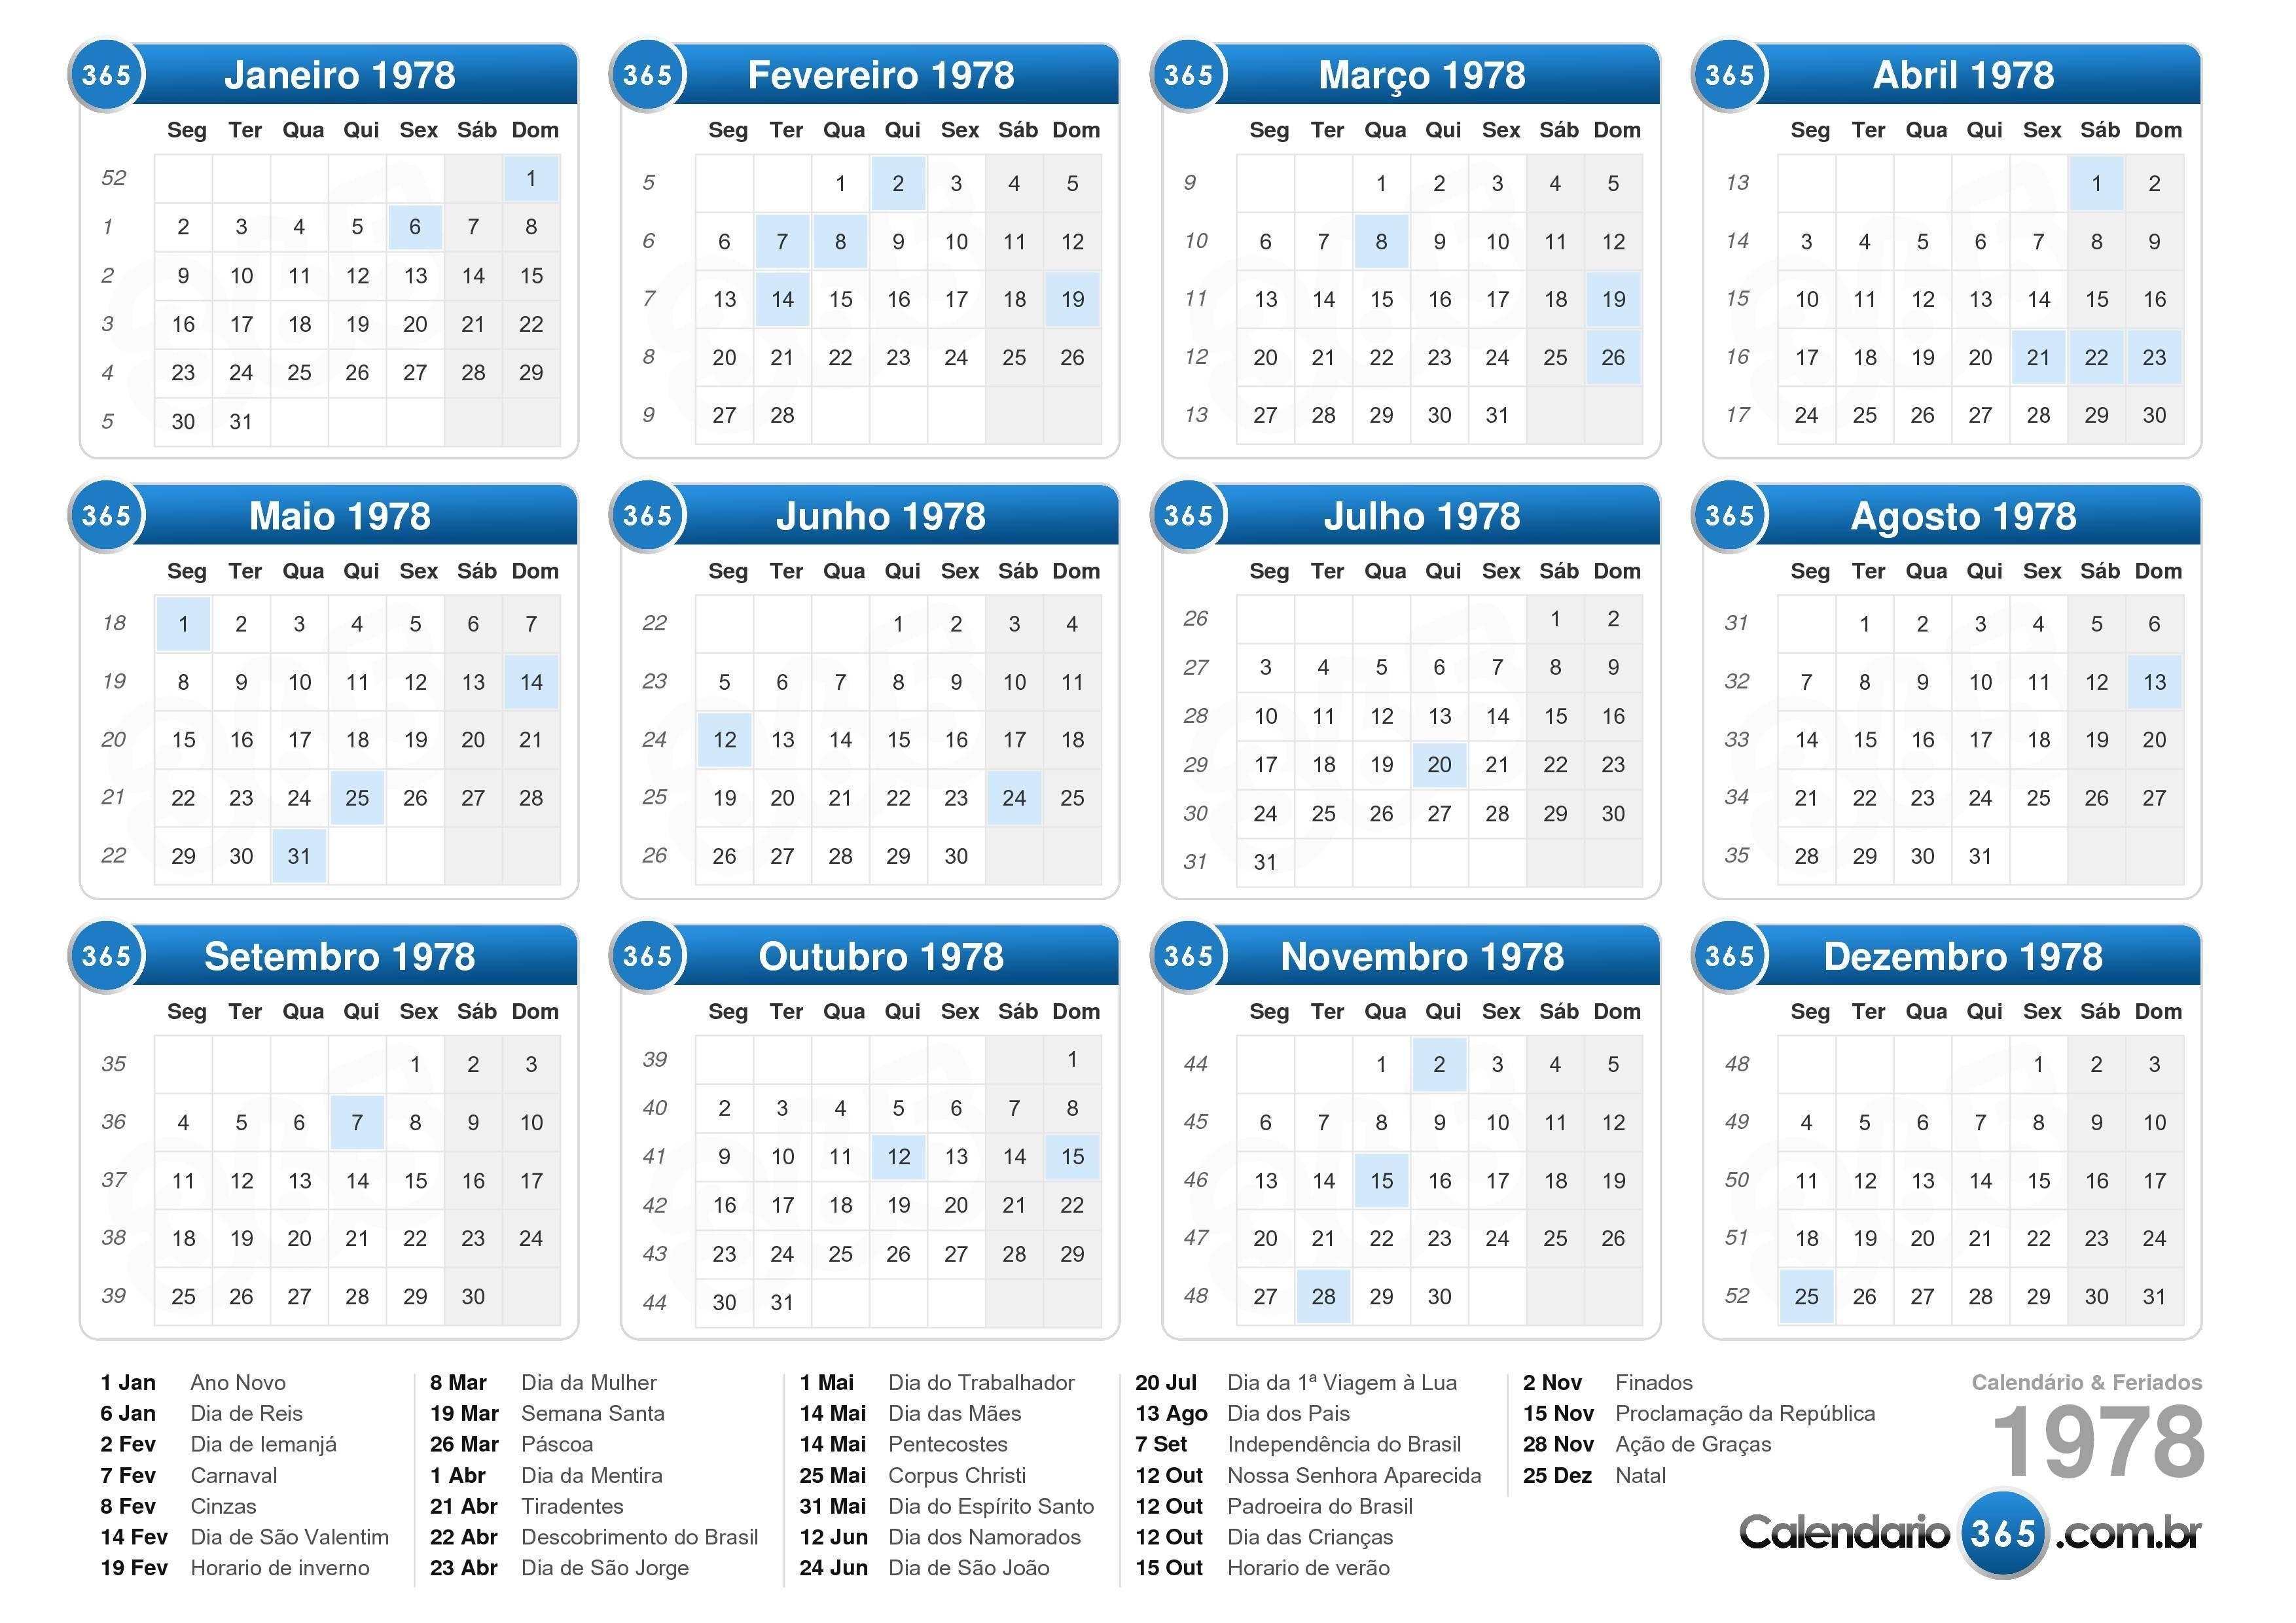 Calendário De Mesa Para Imprimir 2019 Gratis Más Recientes Calendario Novembro 2018 Imprimir T Of Calendário De Mesa Para Imprimir 2019 Gratis Más Actual Calendario Novembro 2018 Imprimir T